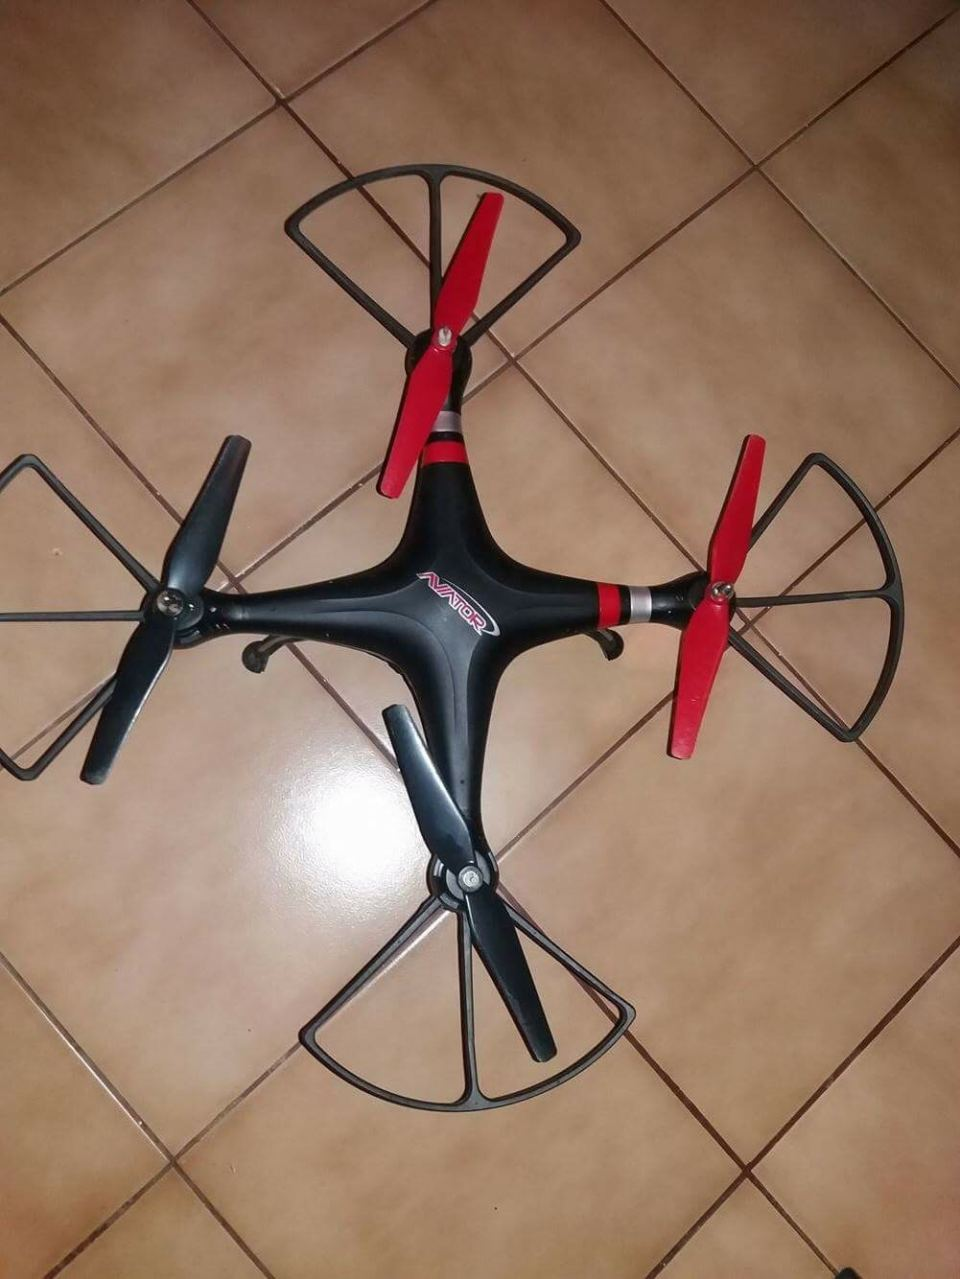 img 2045 ΚΑΡΑΒΟΜΥΛΟΣ ΒΡΕΘΗΚΕ Α.Τ. ΣΤΥΛΙΔΑΣ DRONE